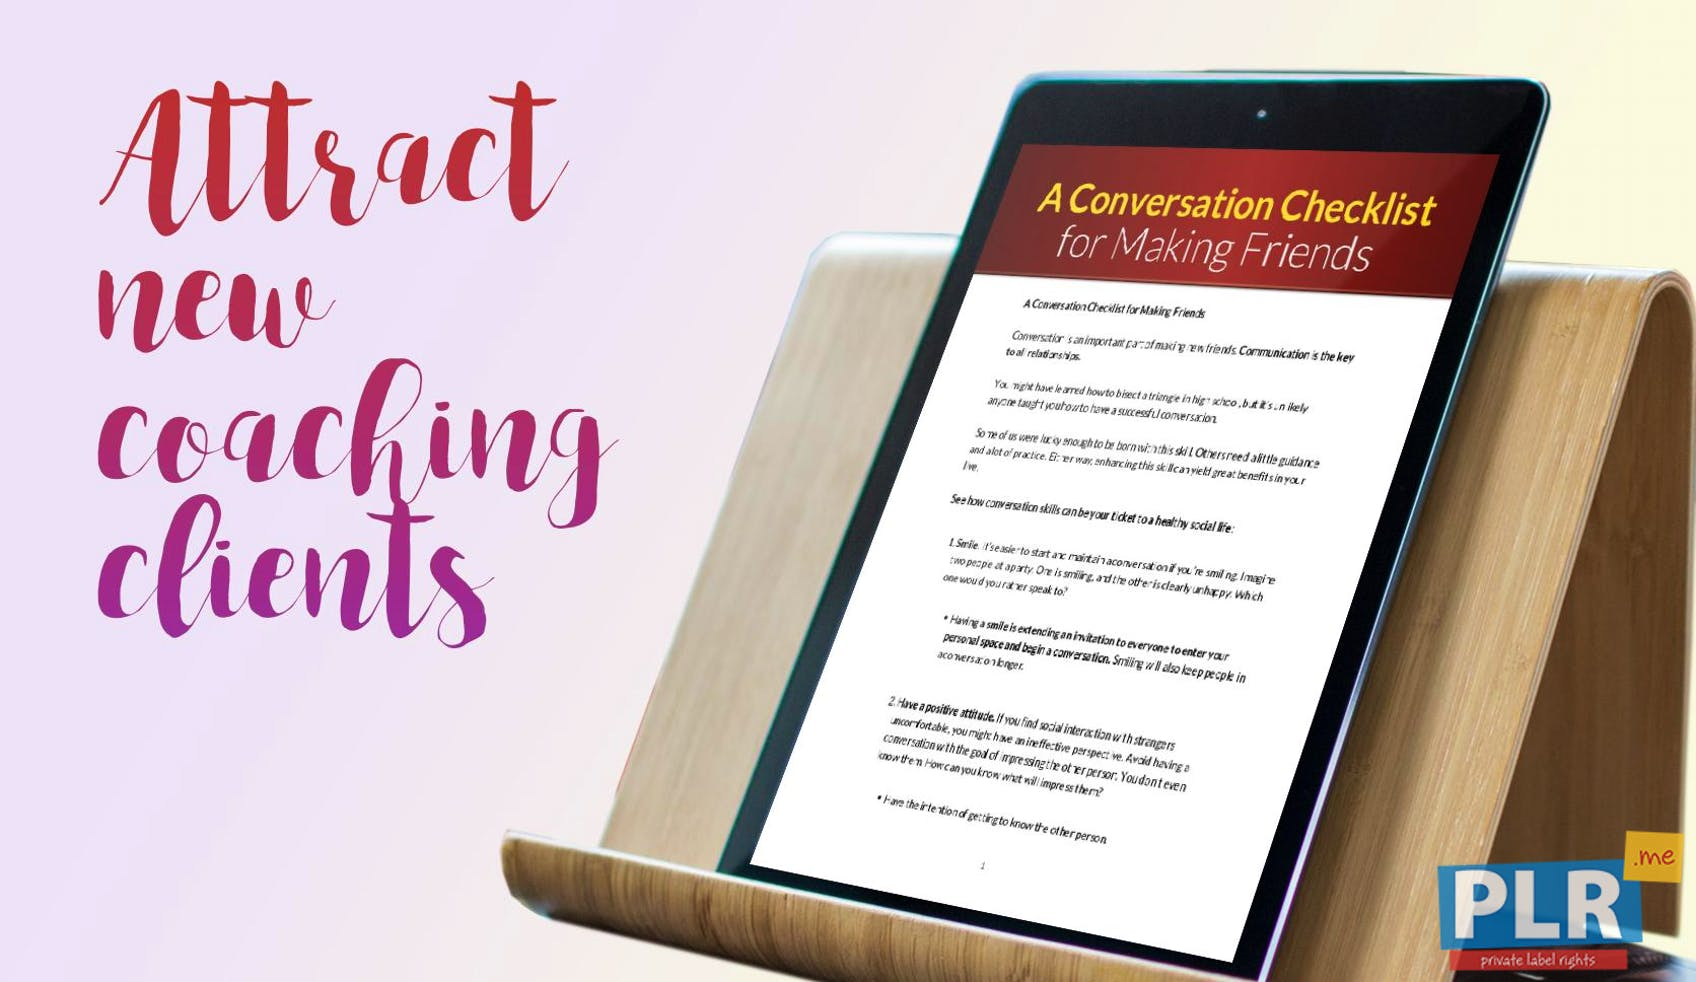 A Conversation Checklist For Making Friends